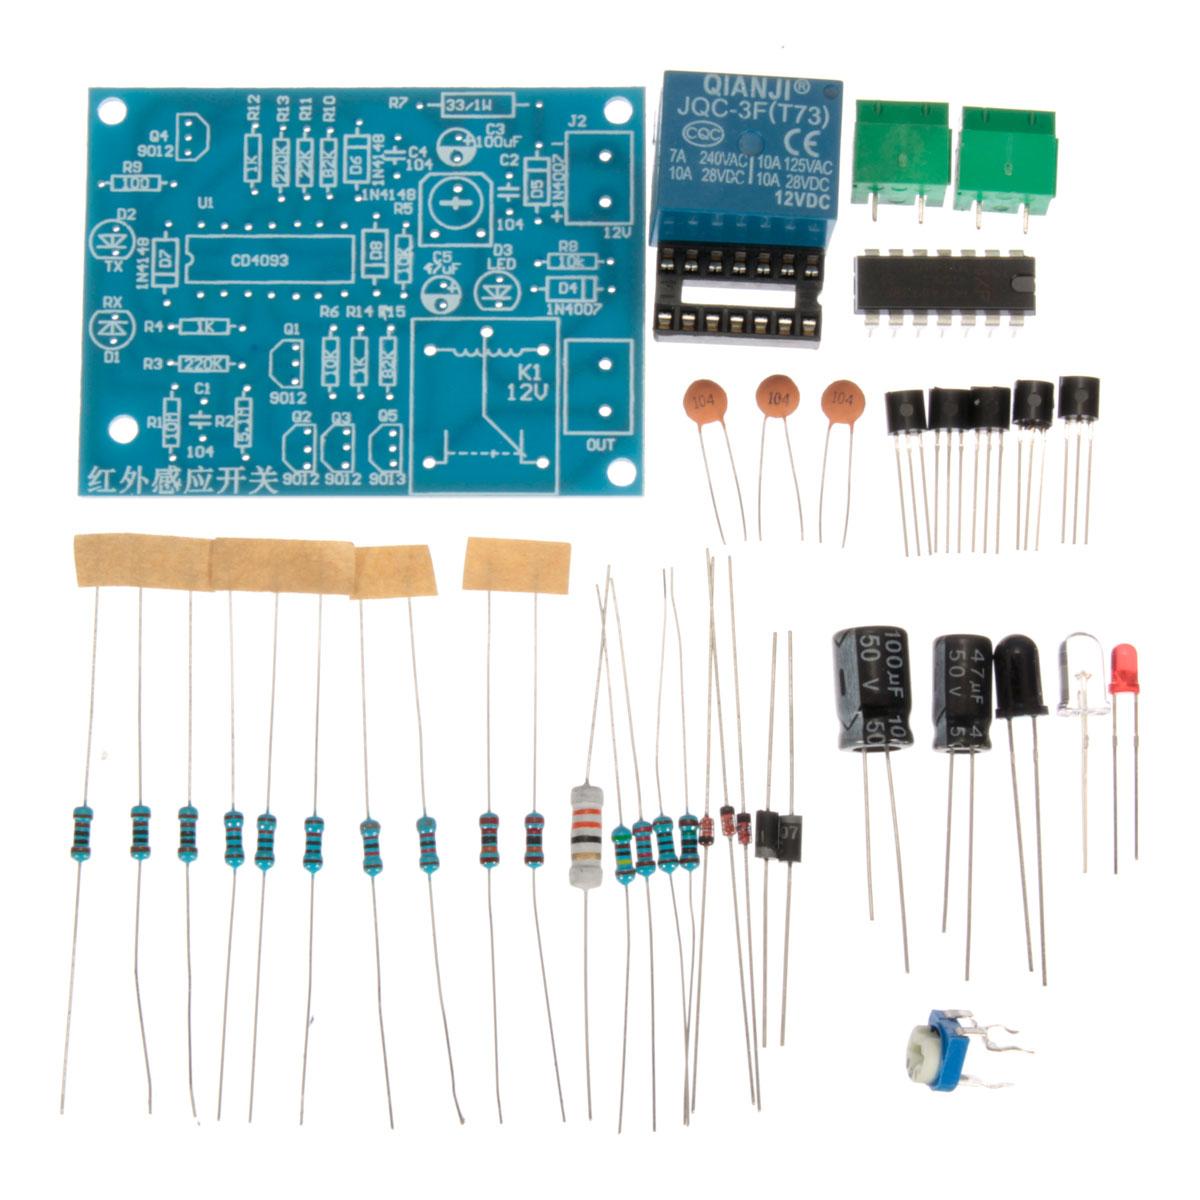 Diy Ir Infrared Sensor Module Switch Electronic Kit How To Build Detector Circuit Diagram